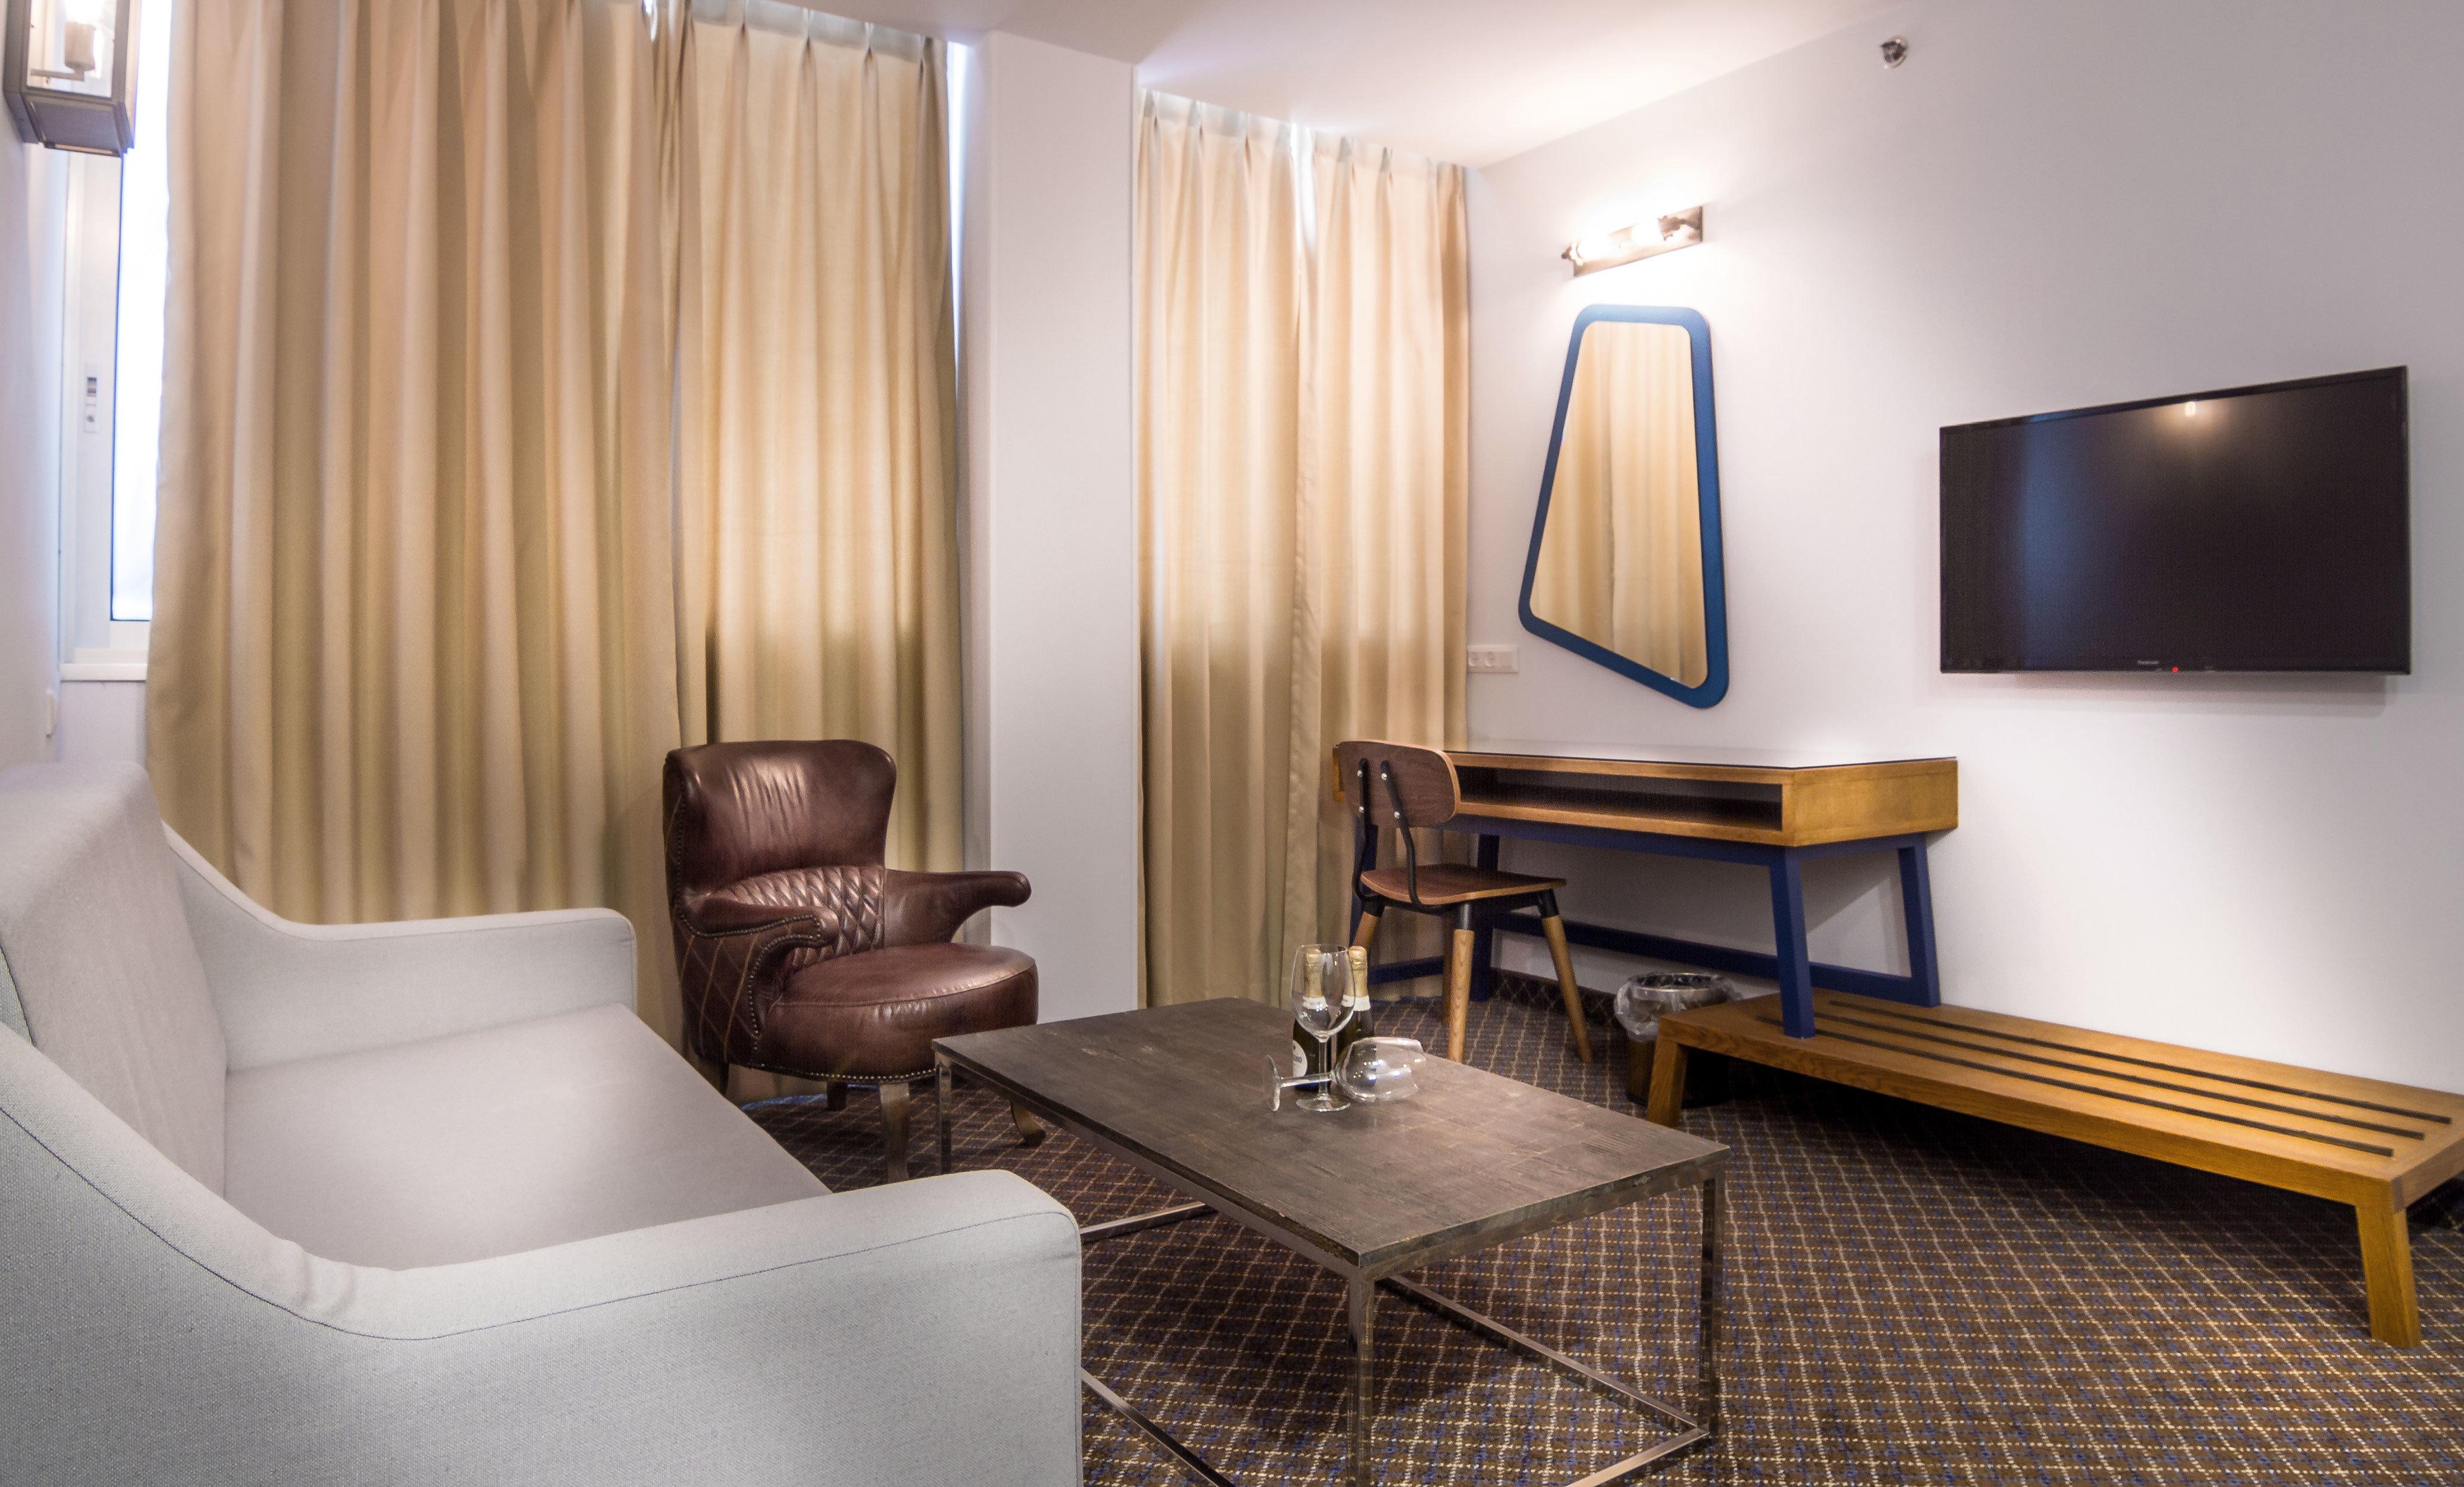 City Classic Lounge Suite property curtain condominium Bedroom living room Modern